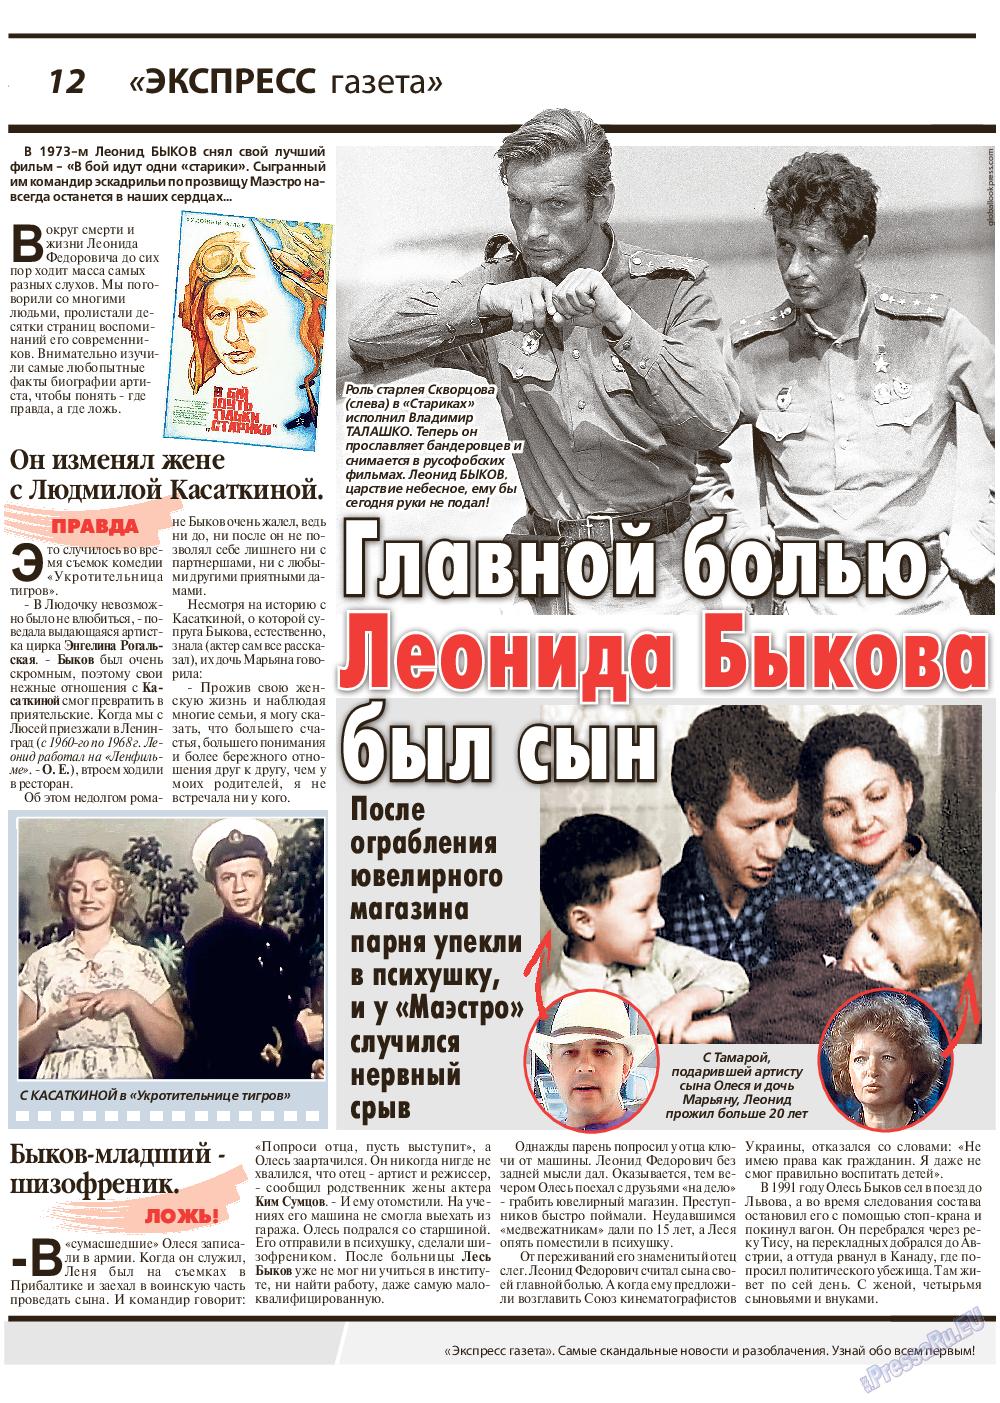 Экспресс газета (газета). 2019 год, номер 6, стр. 12